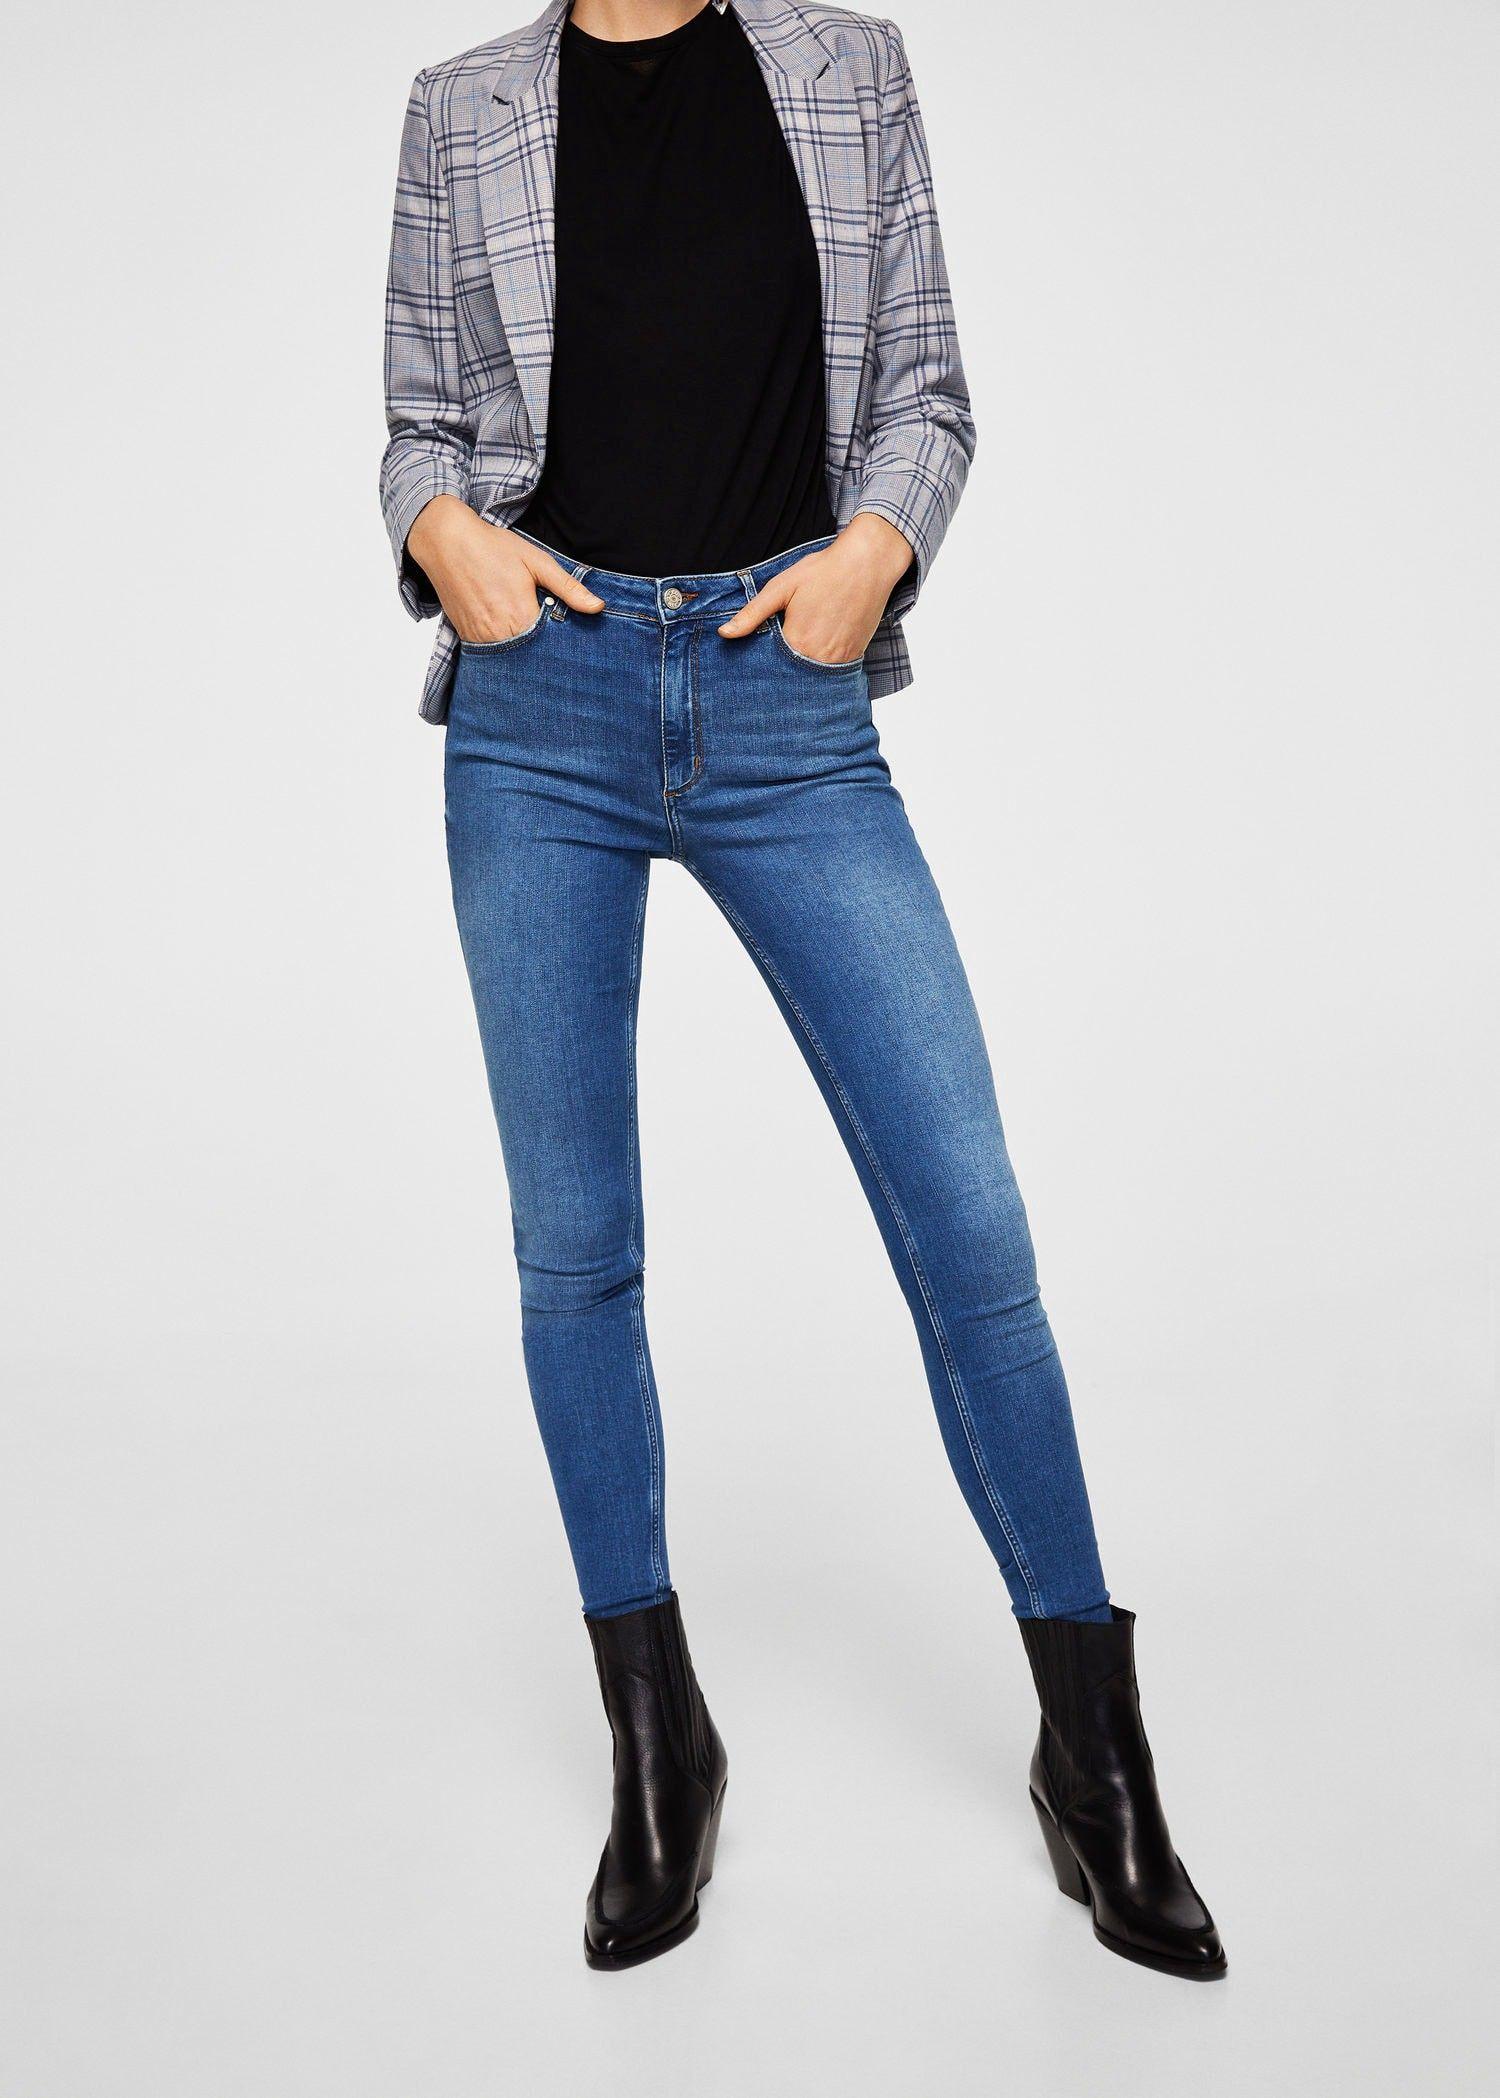 Mango super slimfit andrea jeans women 2 slim jeans